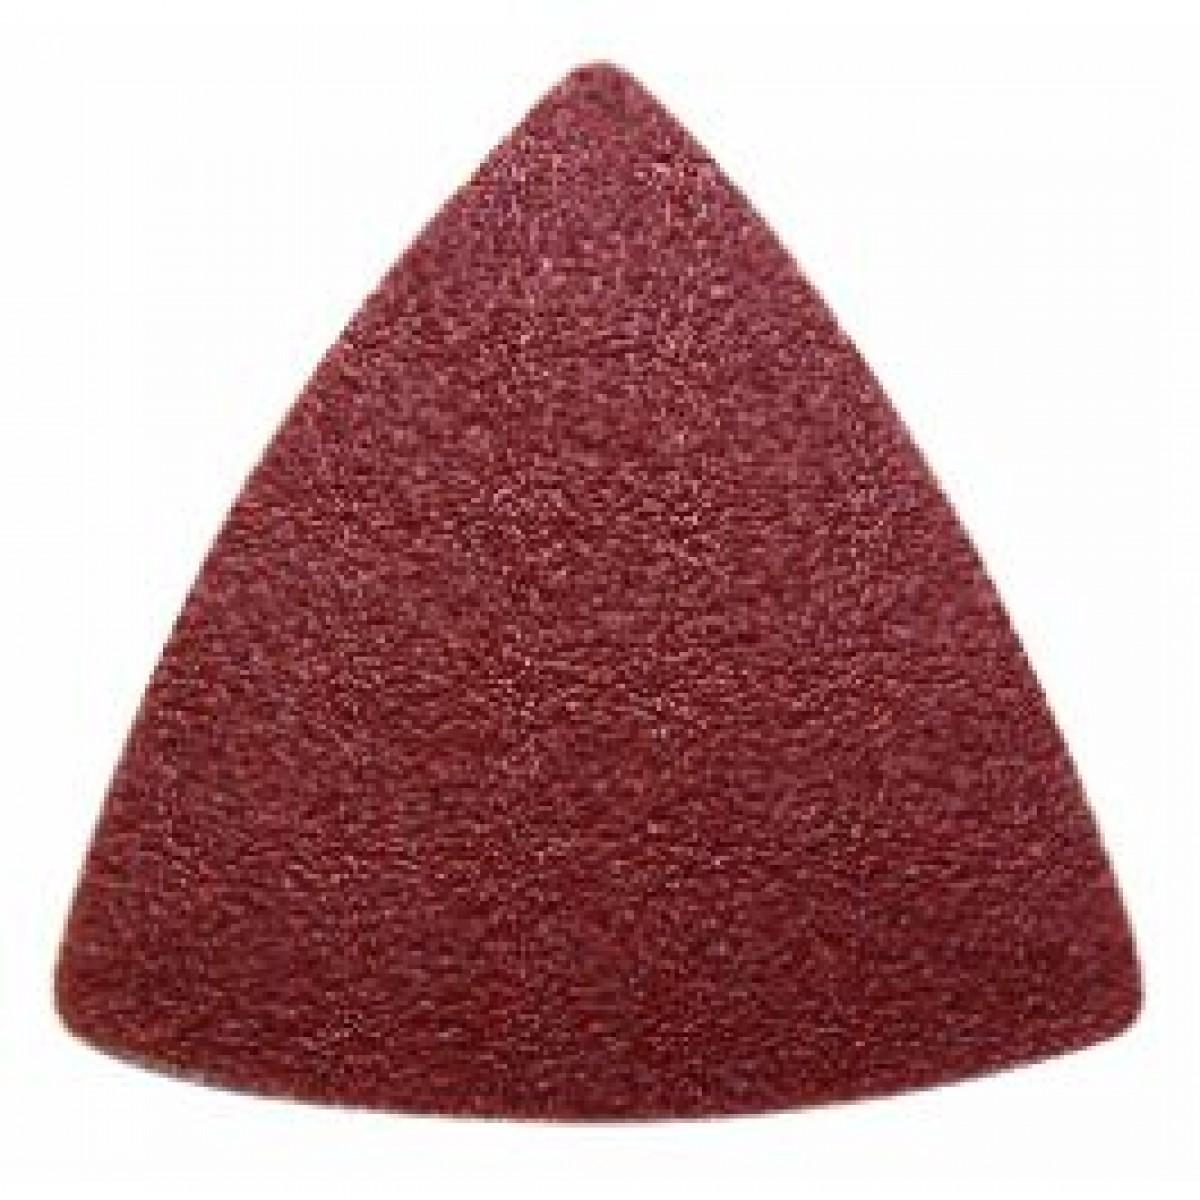 60 Grit Triangular Sanding Sheets 5 Pack